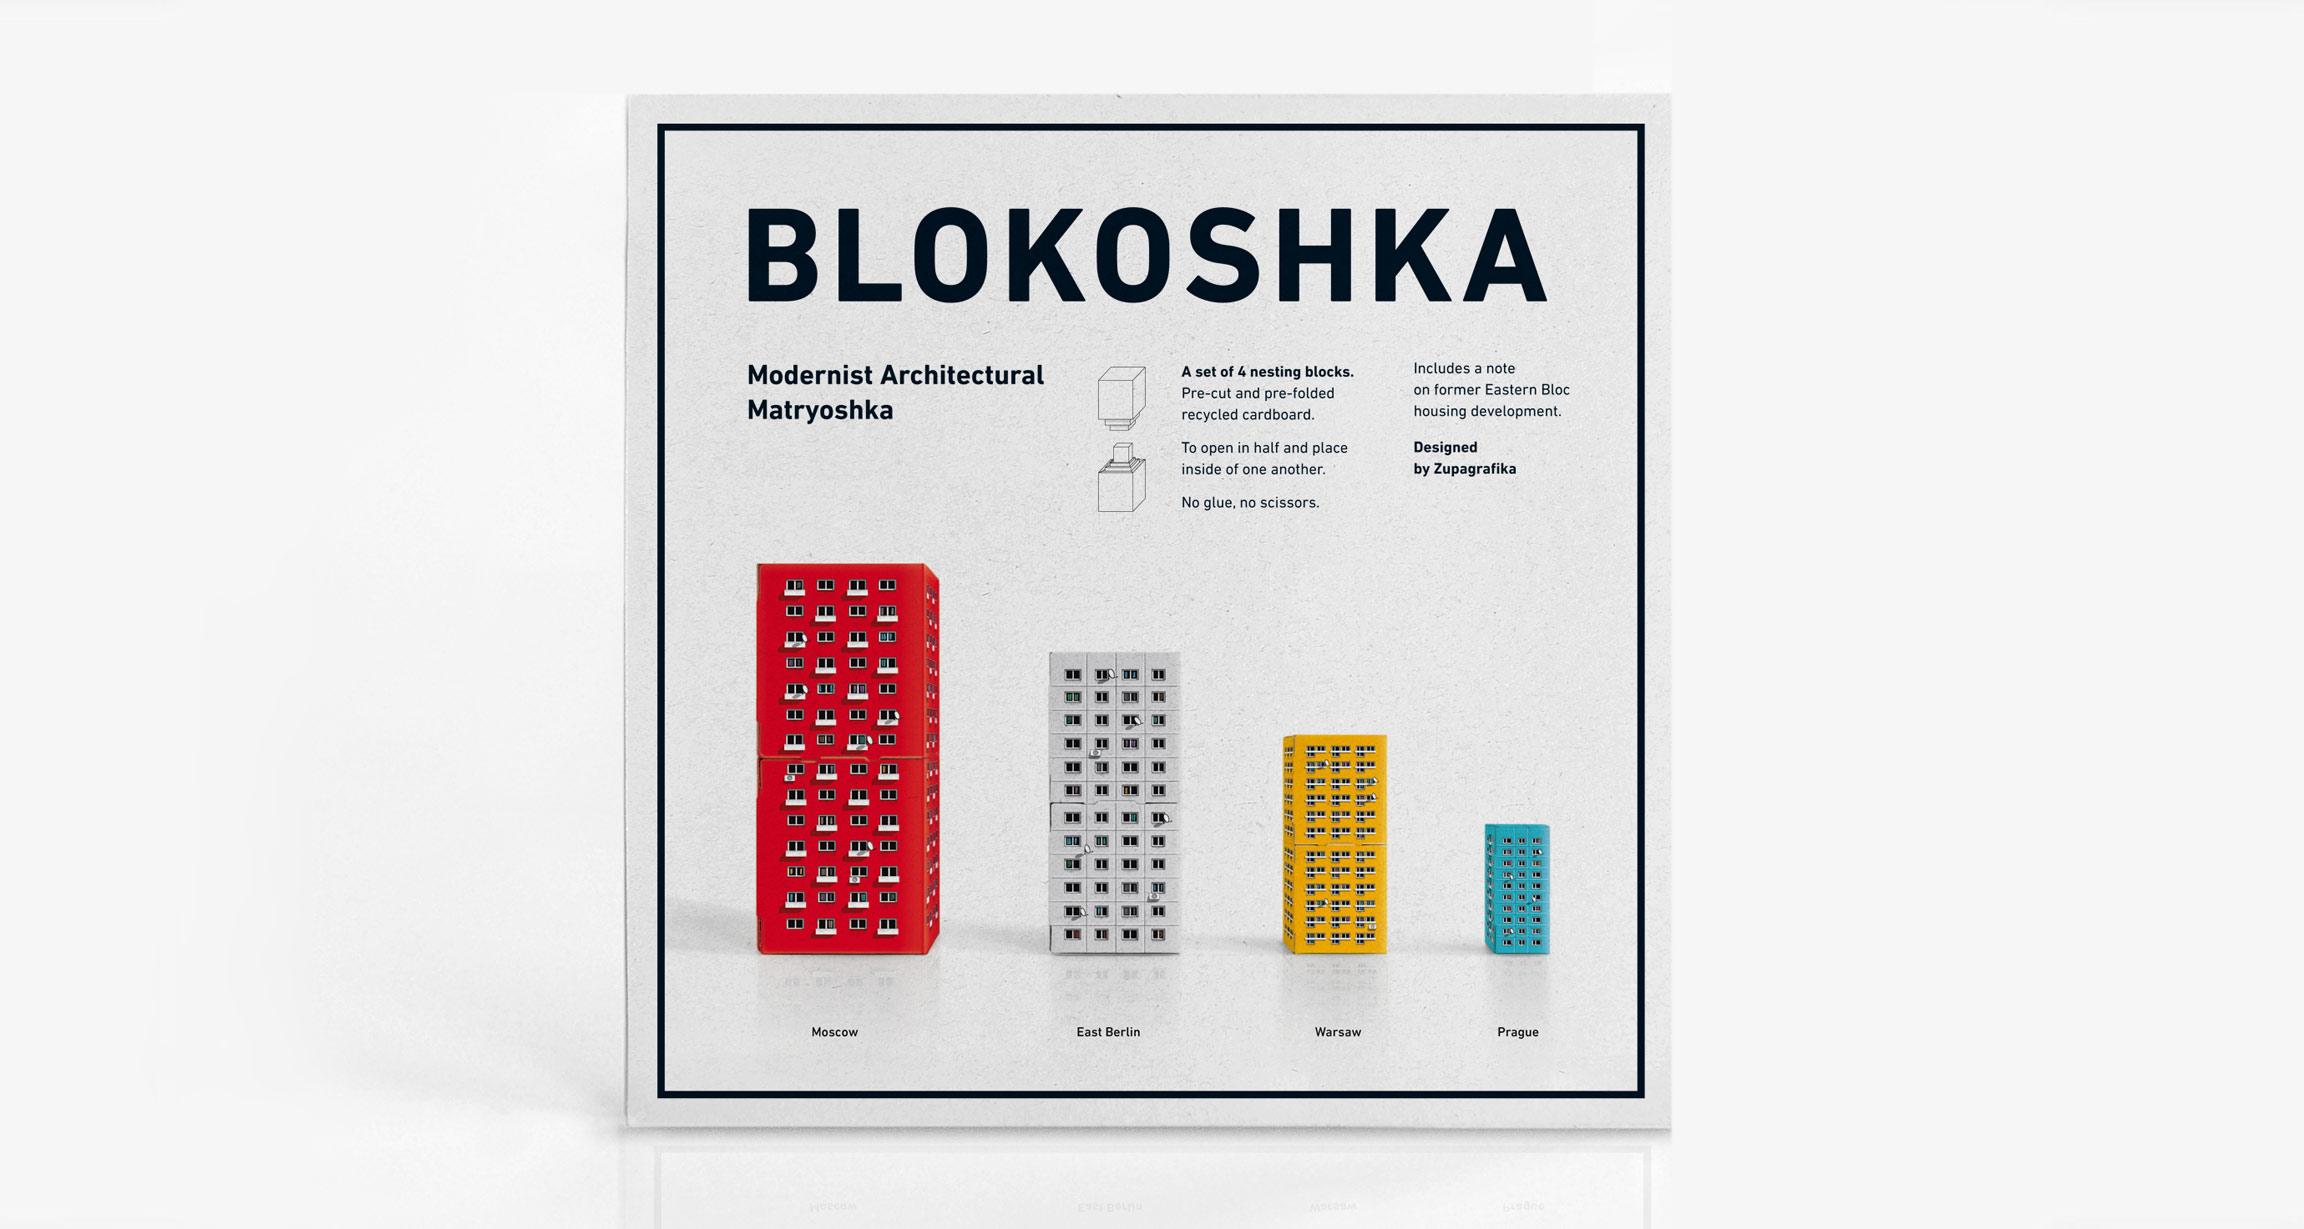 Blokoshka: Modernist Architectural Matryoshka